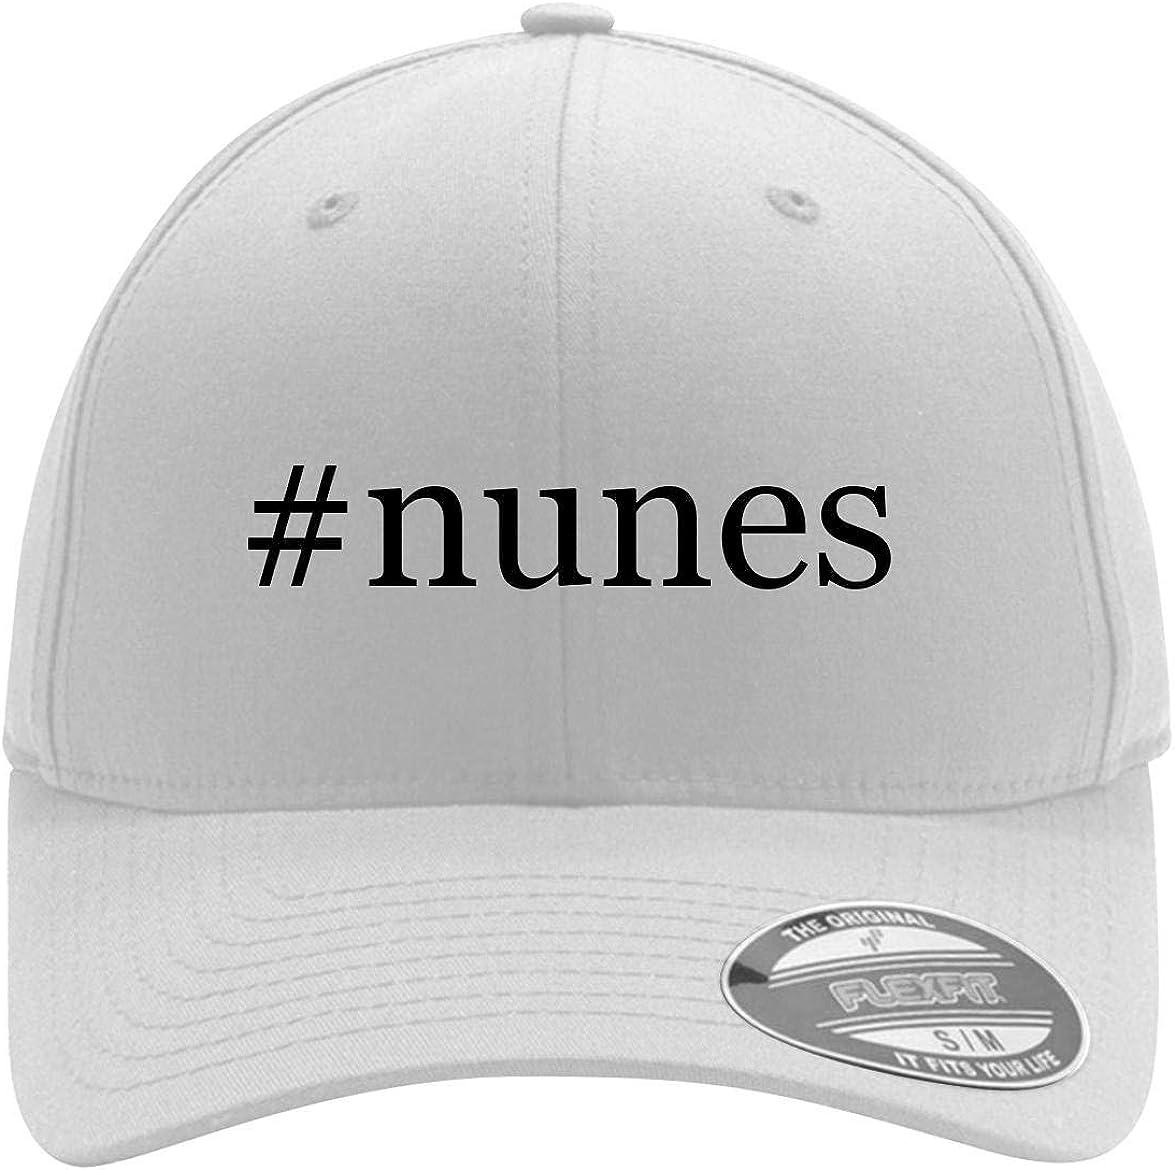 #nunes - Adult Men's Hashtag Flexfit Baseball Hat Cap 61vt43FtpyL